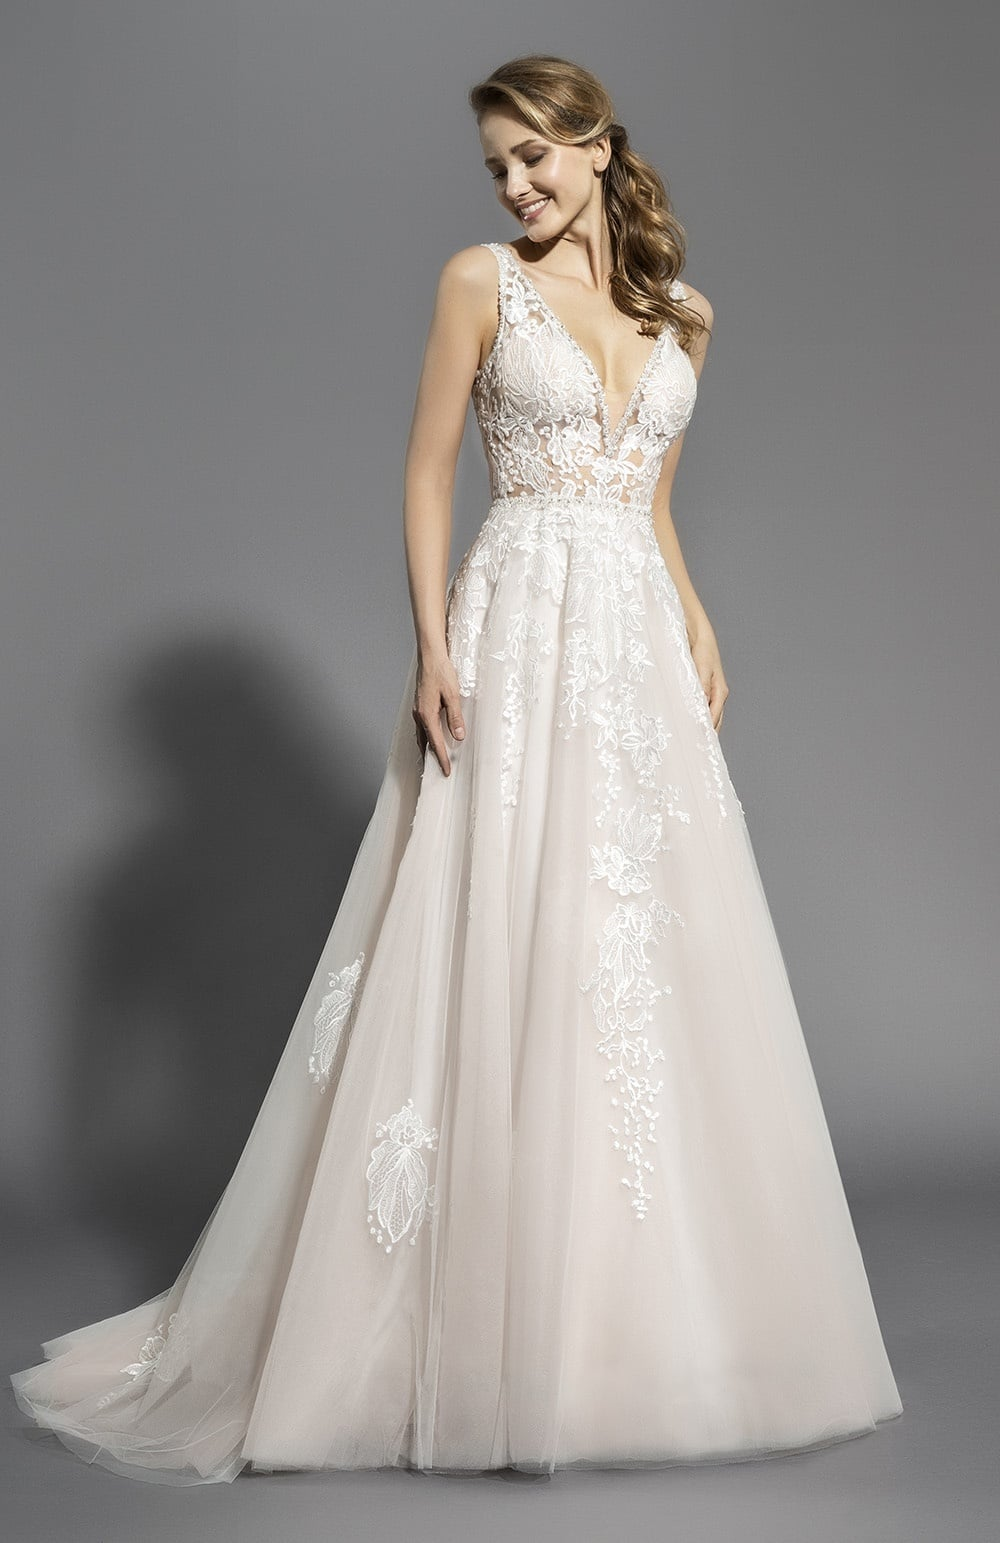 Robe de mariée Modèle Maja